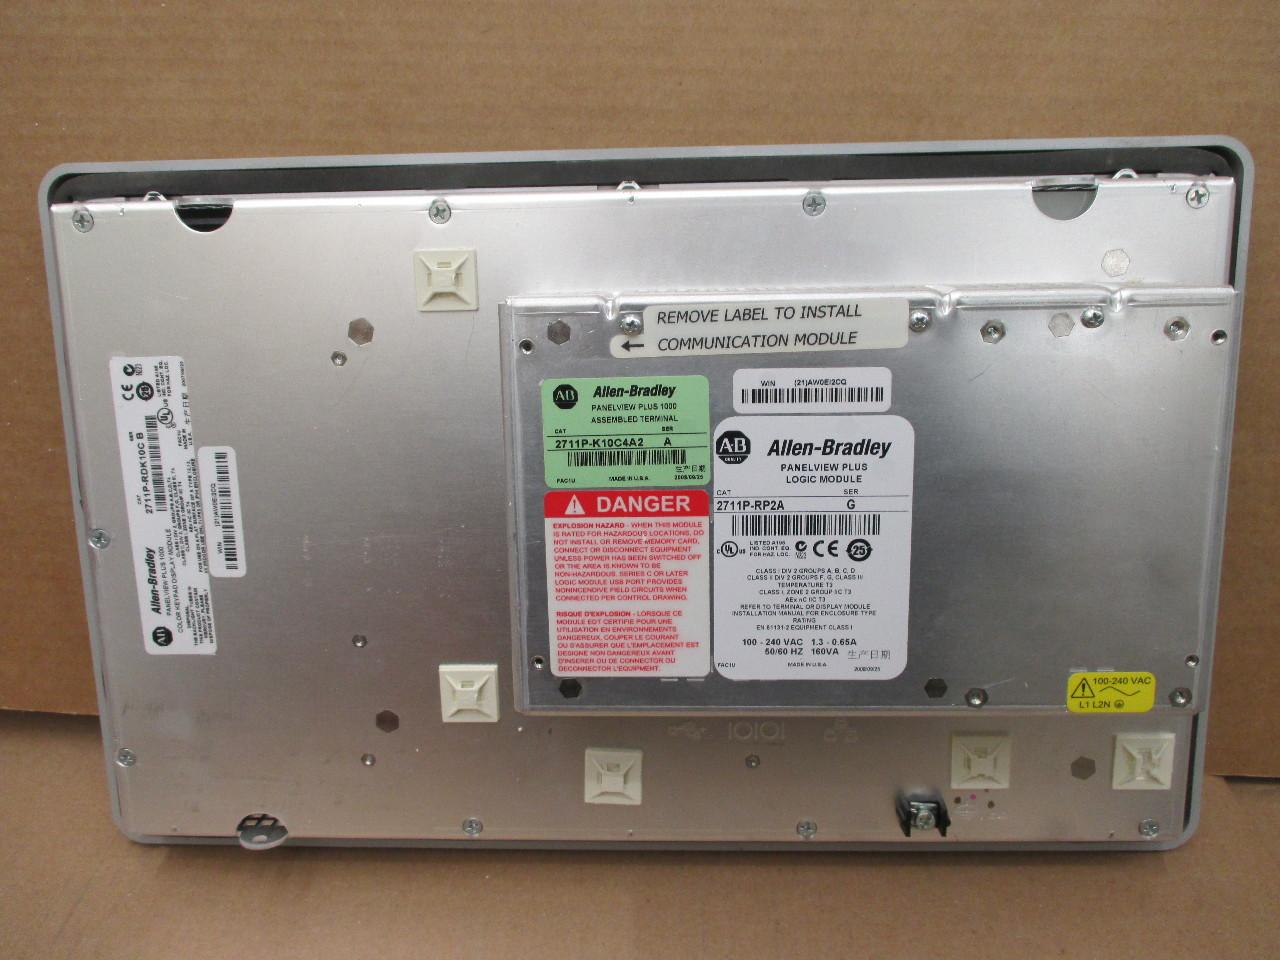 Allen Bradley Power Monitor 1000 : Amazing allen bradley pictures inspiration